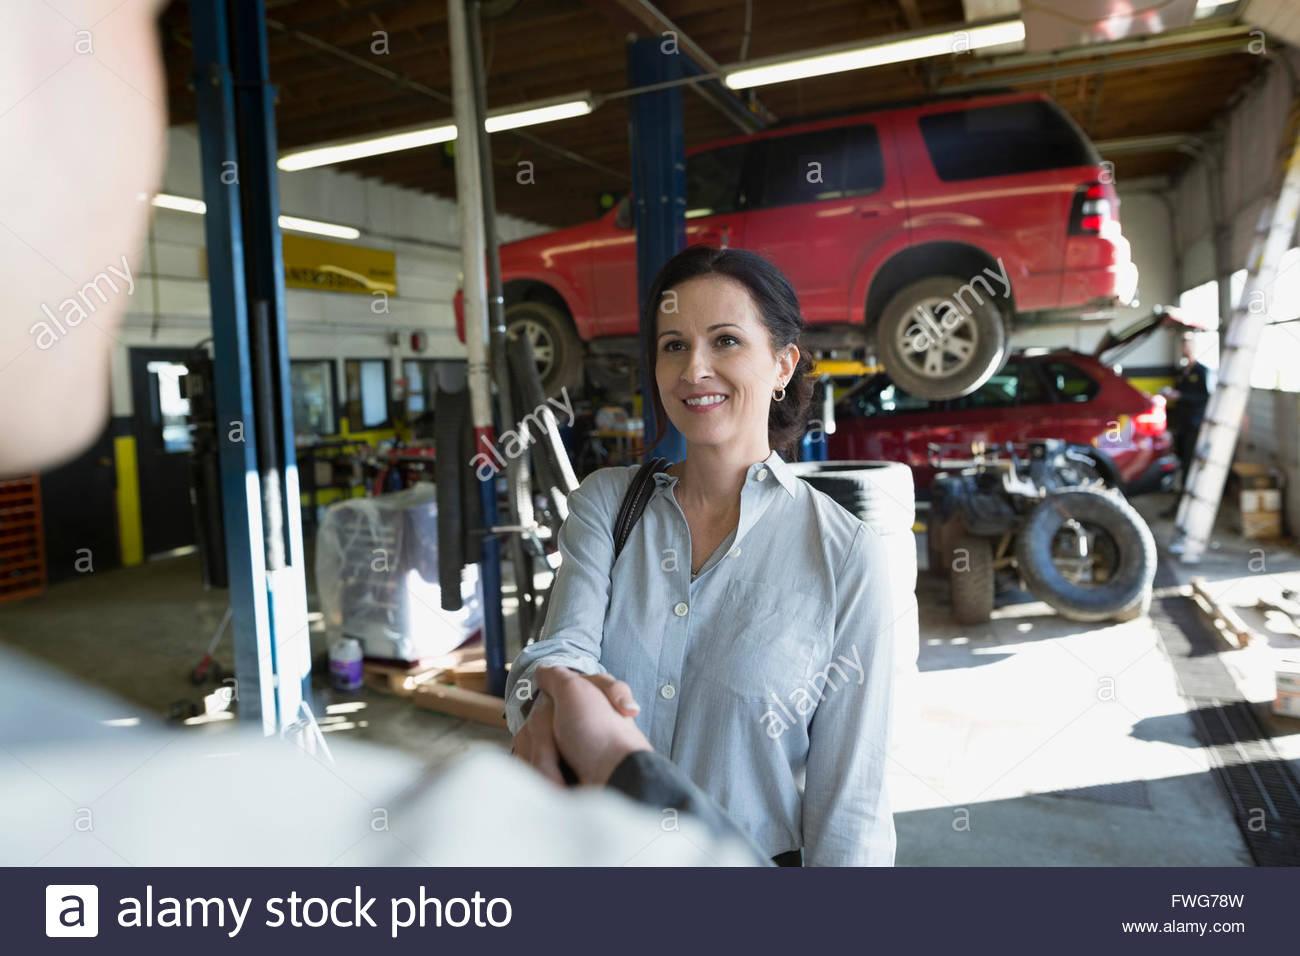 Customer and mechanic shaking hands auto repair shop - Stock Image